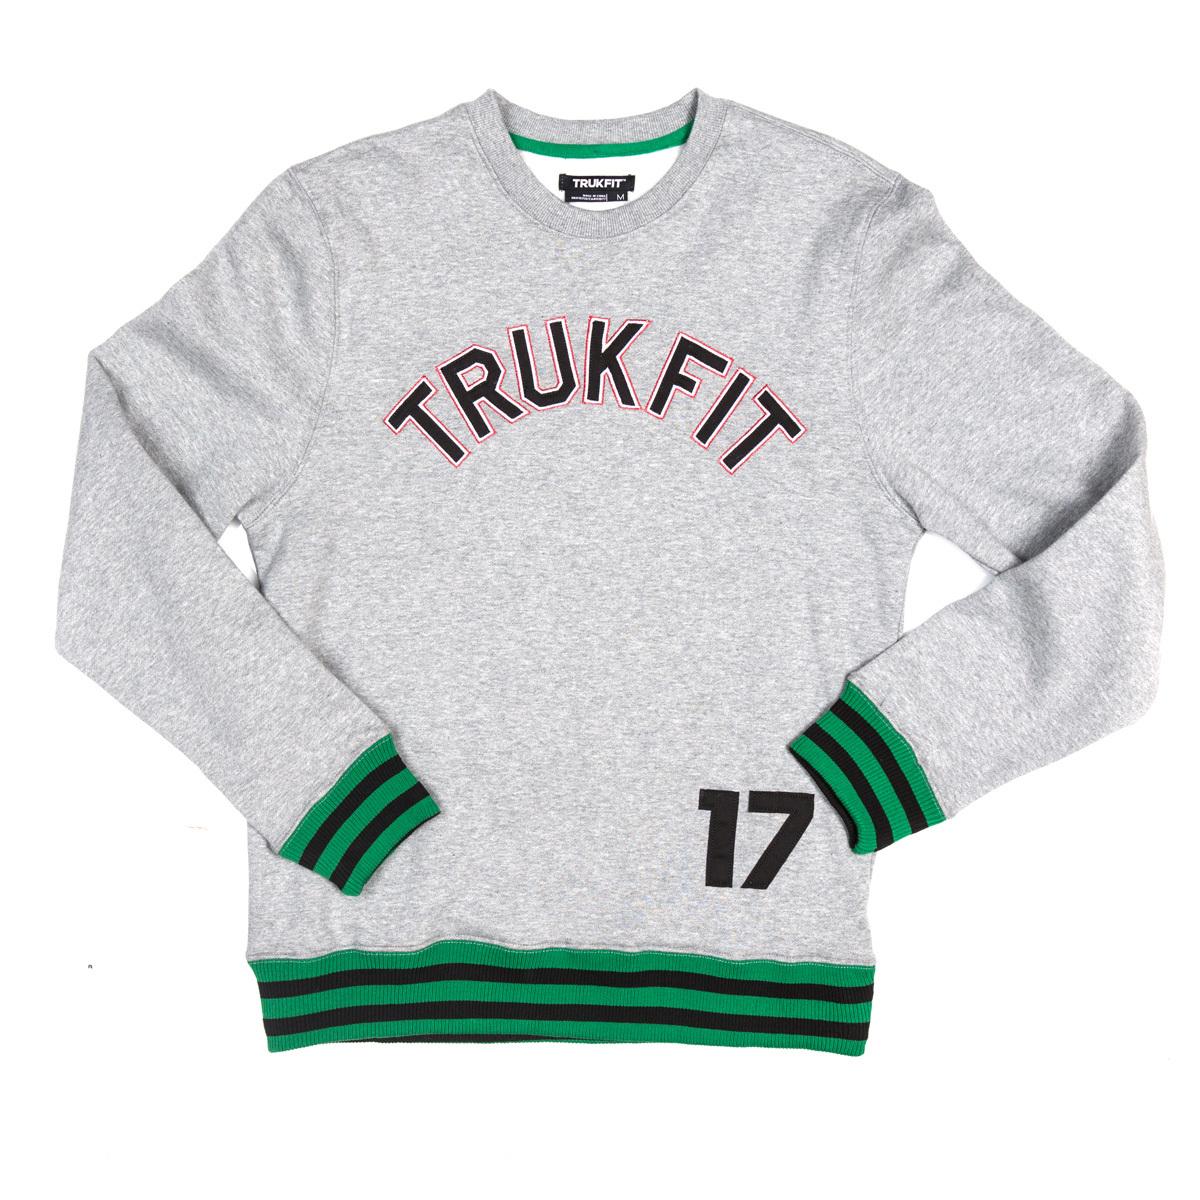 Trukfit Core Crew Sweatshirt